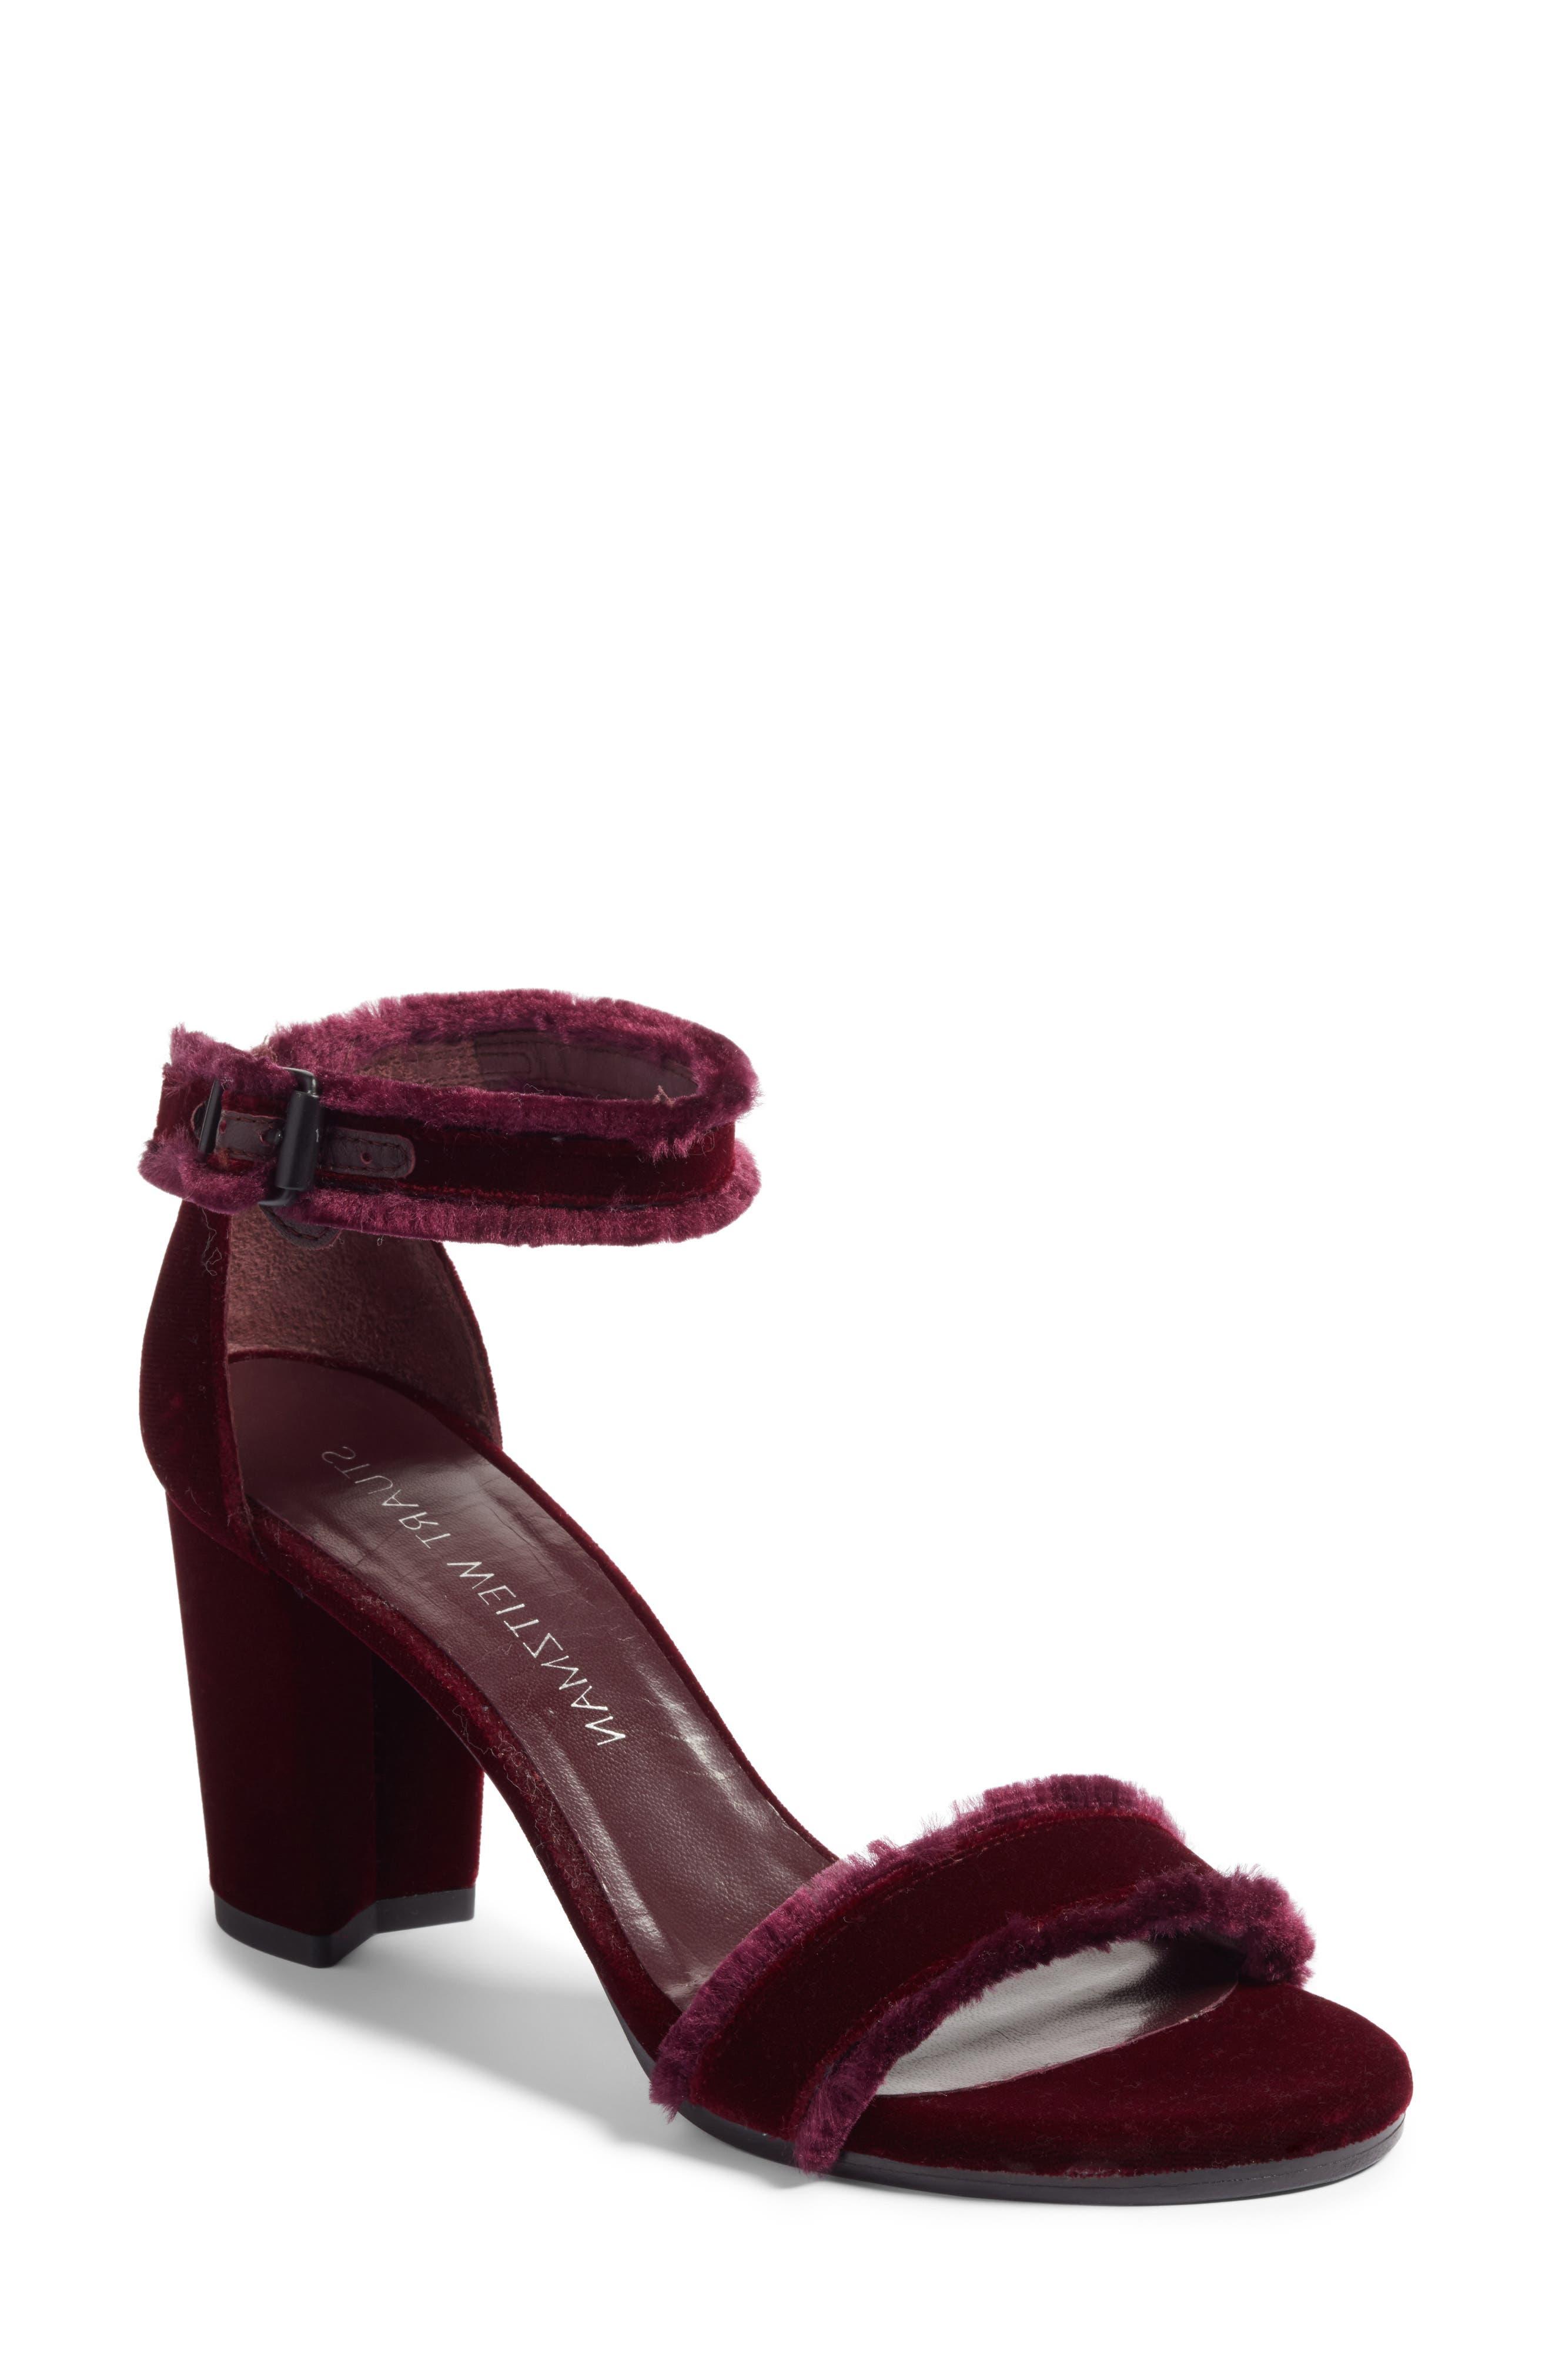 Alternate Image 1 Selected - Stuart Weitzman Frayed Ankle Strap Sandal (Women)